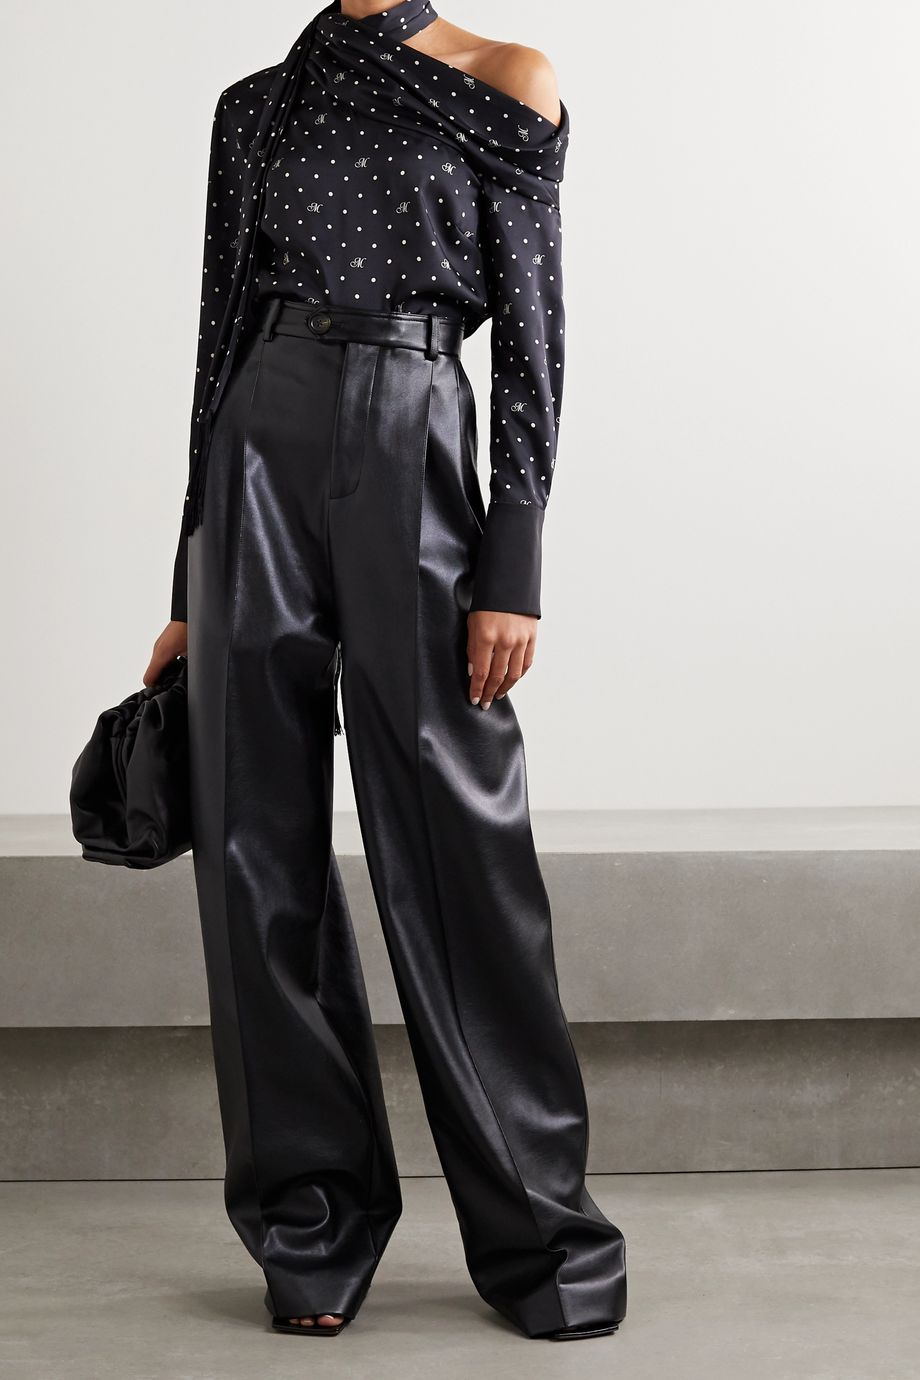 Monse One-shoulder fringed polka-dot satin-twill blouse